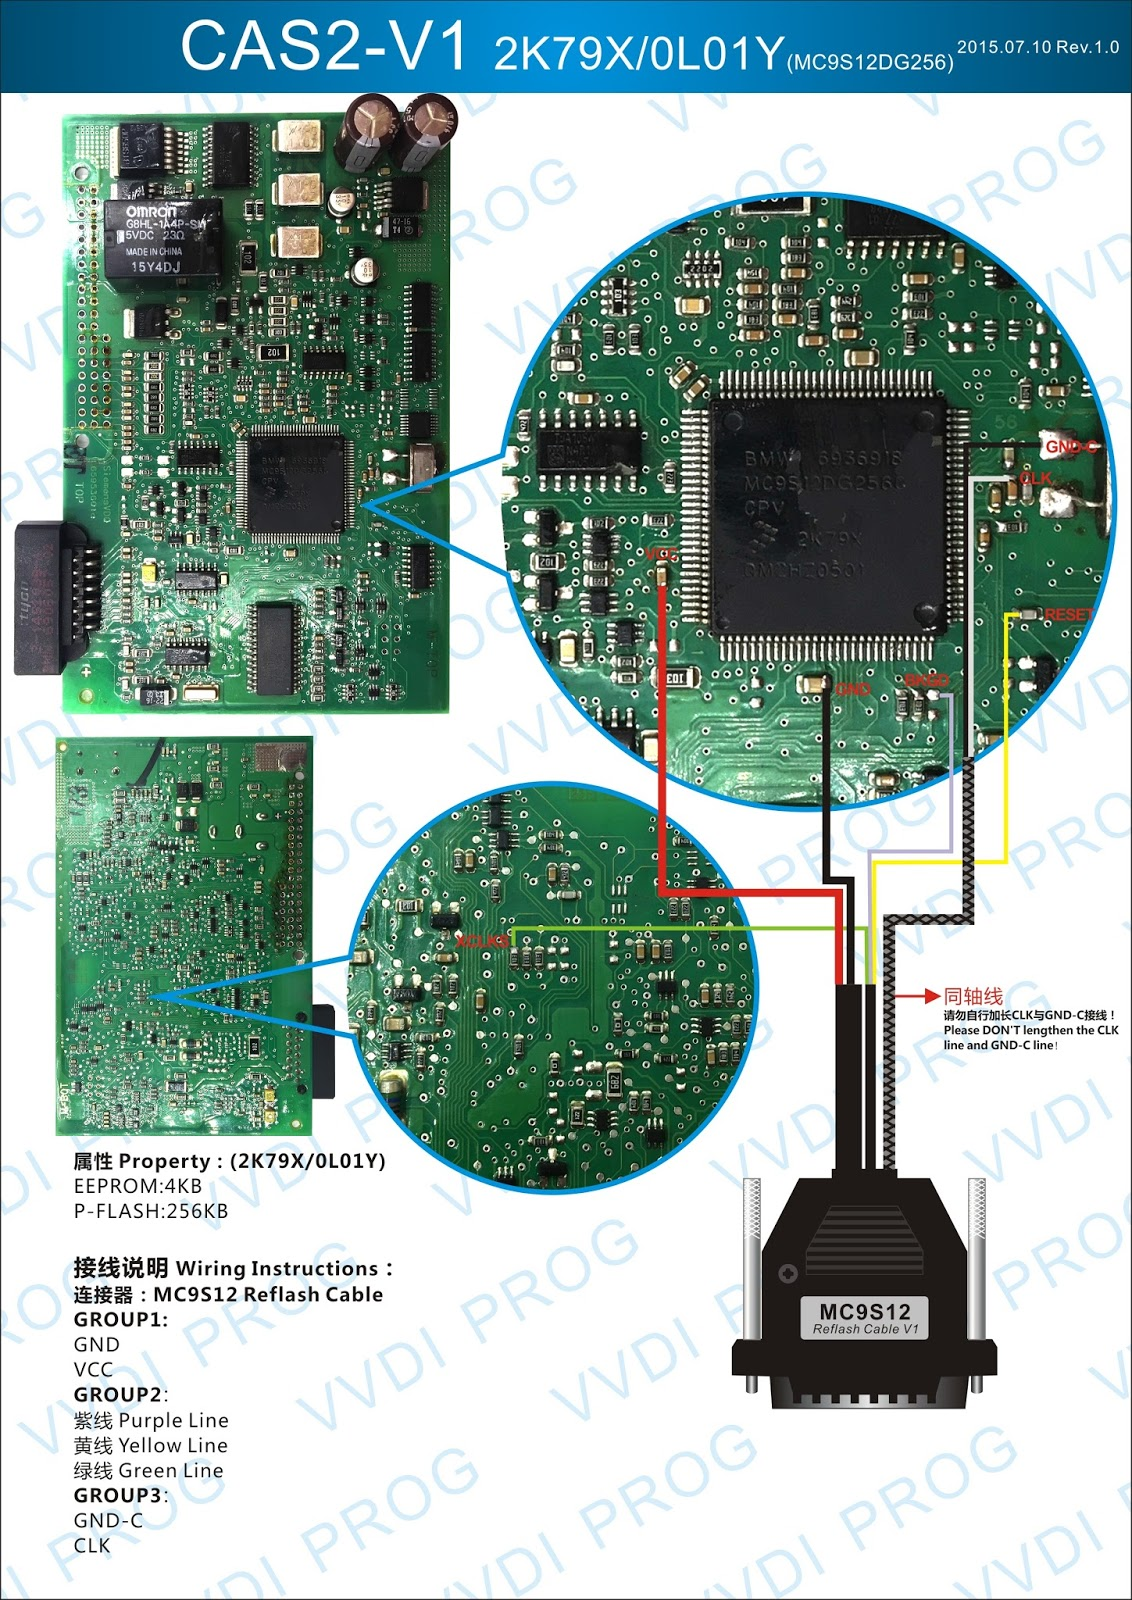 Here is the car ecu wiring diagrams for xhorse vvdi prog programmer 4 1 2 at http www obdii365 com wholesale vvdi prog programmer html